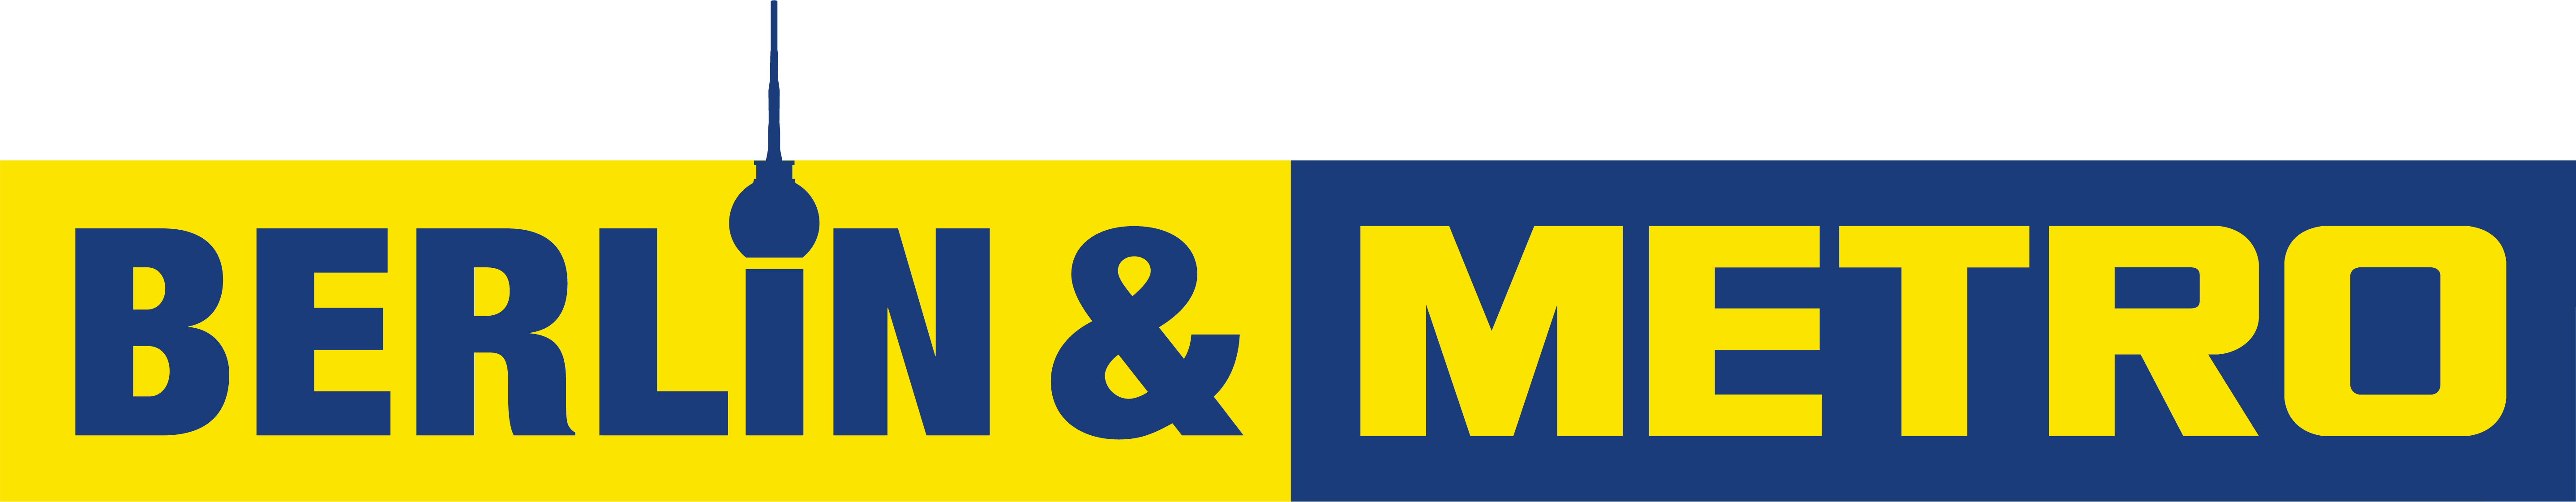 METRO BERLIN logo rz RGB